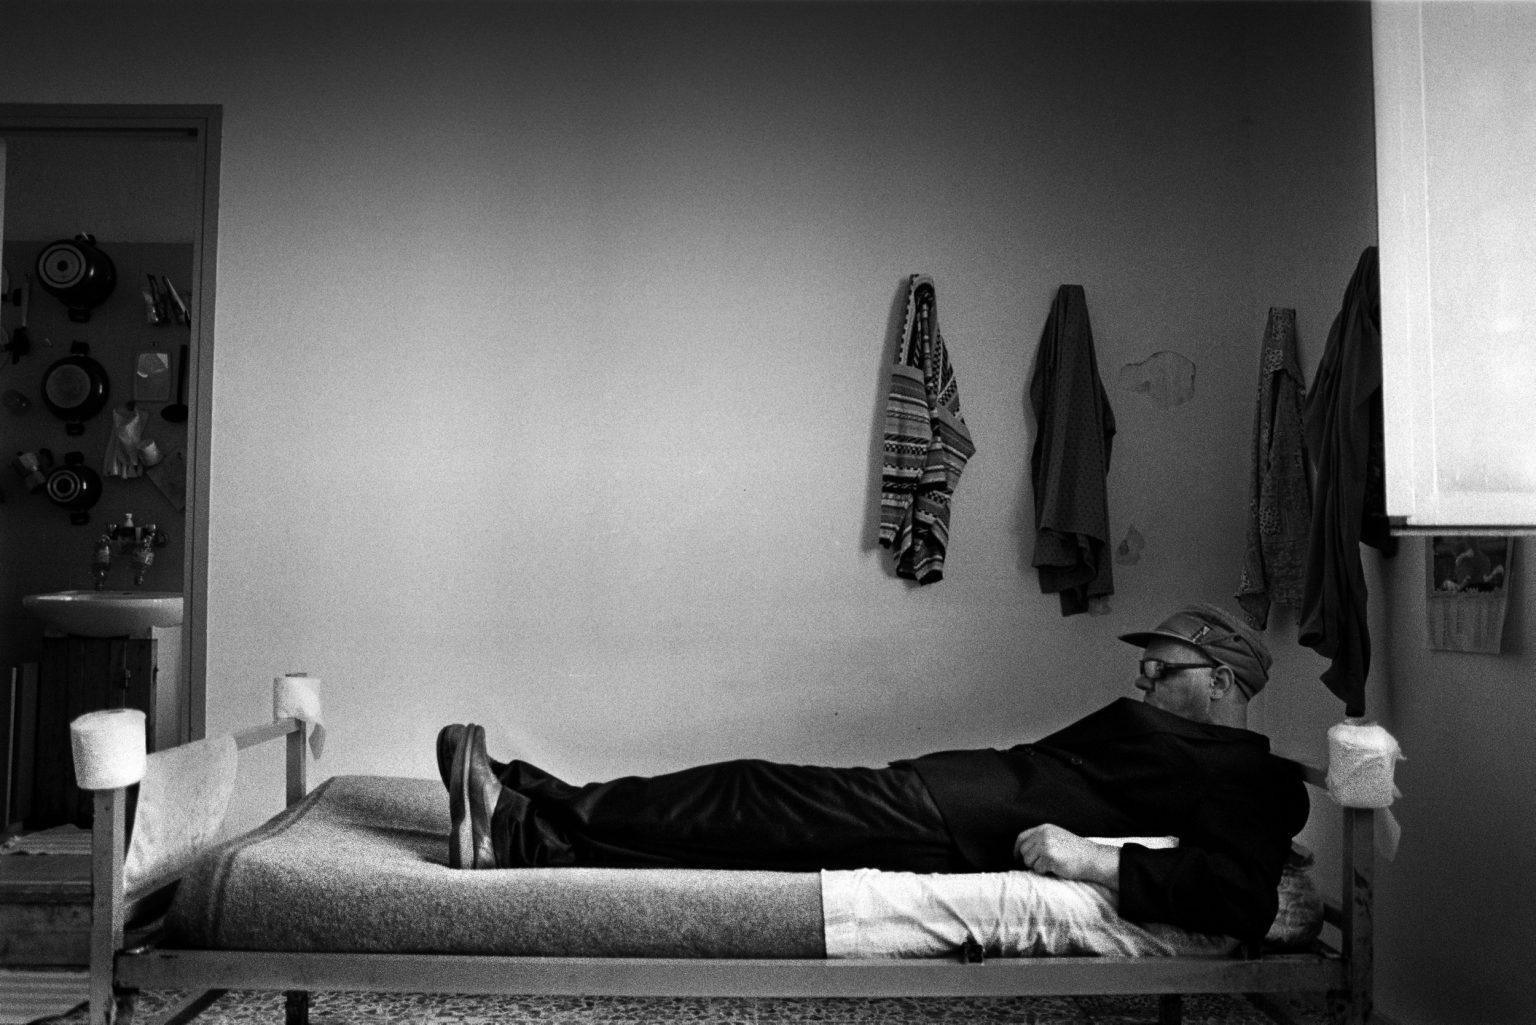 "Aversa ( Caserta ), December 2007 - The Judicial Psychiatric Hospital ""Filippo Saporito"" - An inmate lying on his bed"